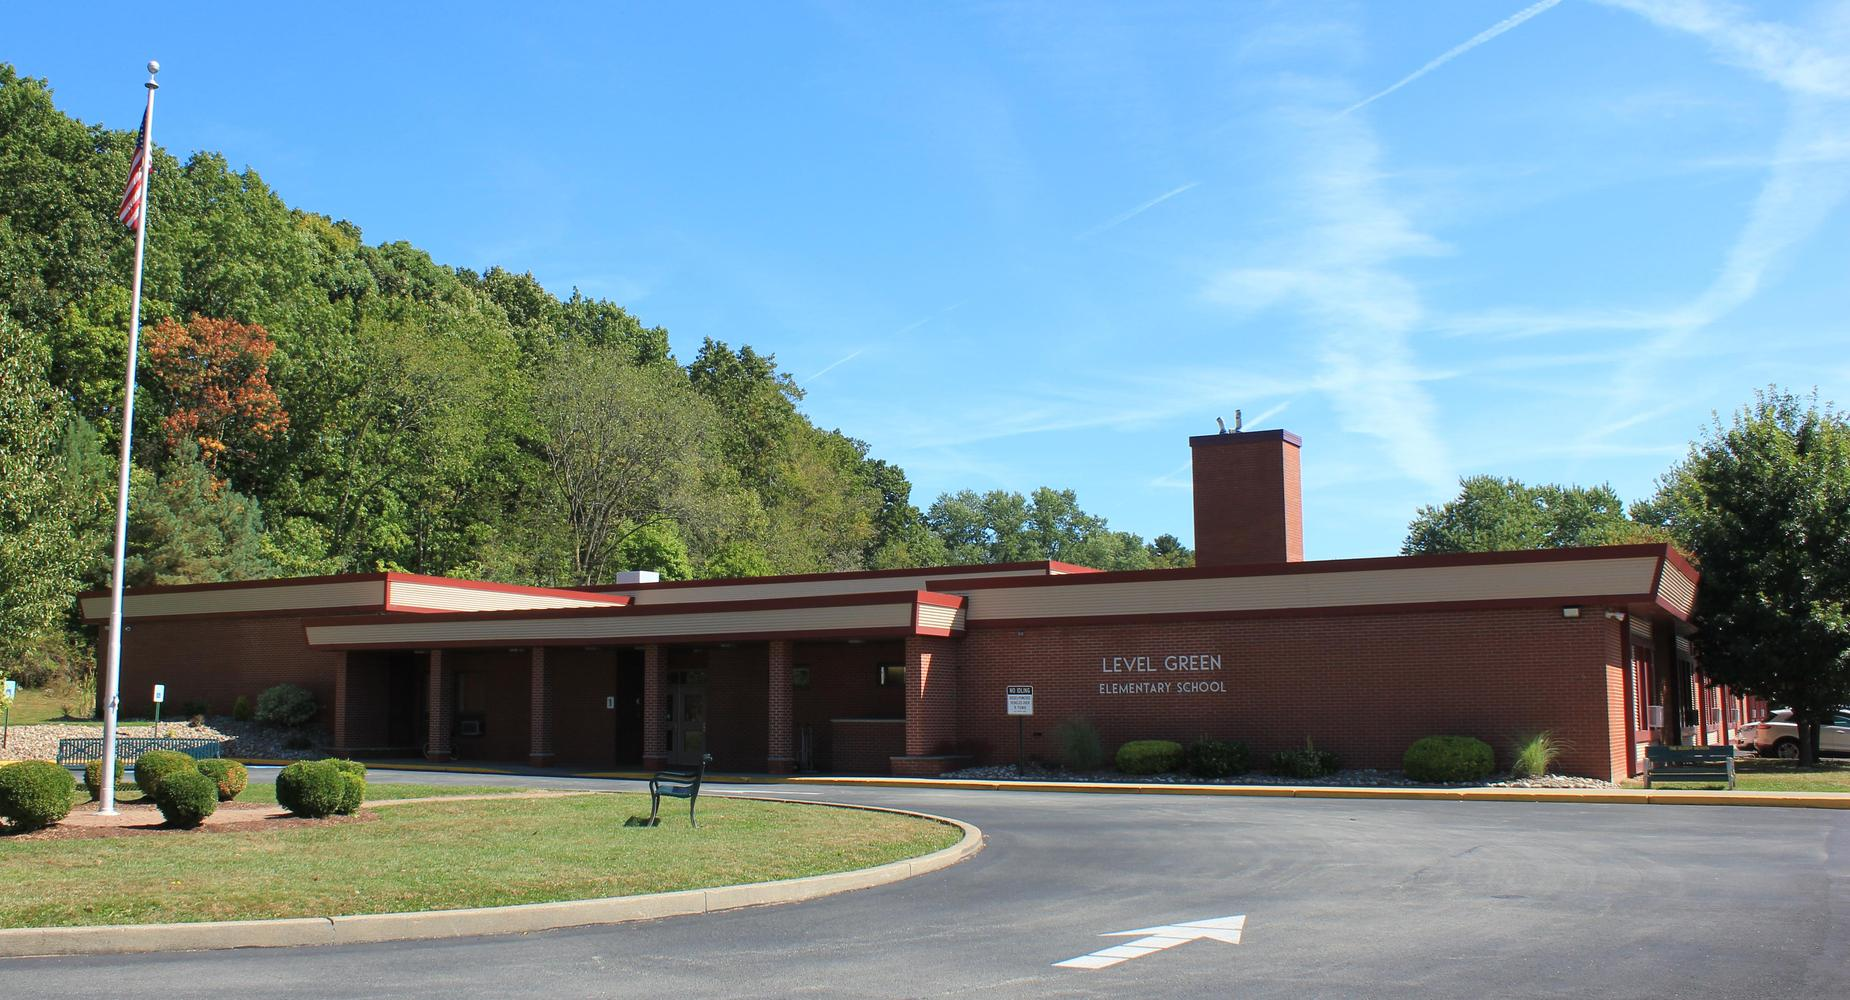 Exterior of Level Green Elementary School